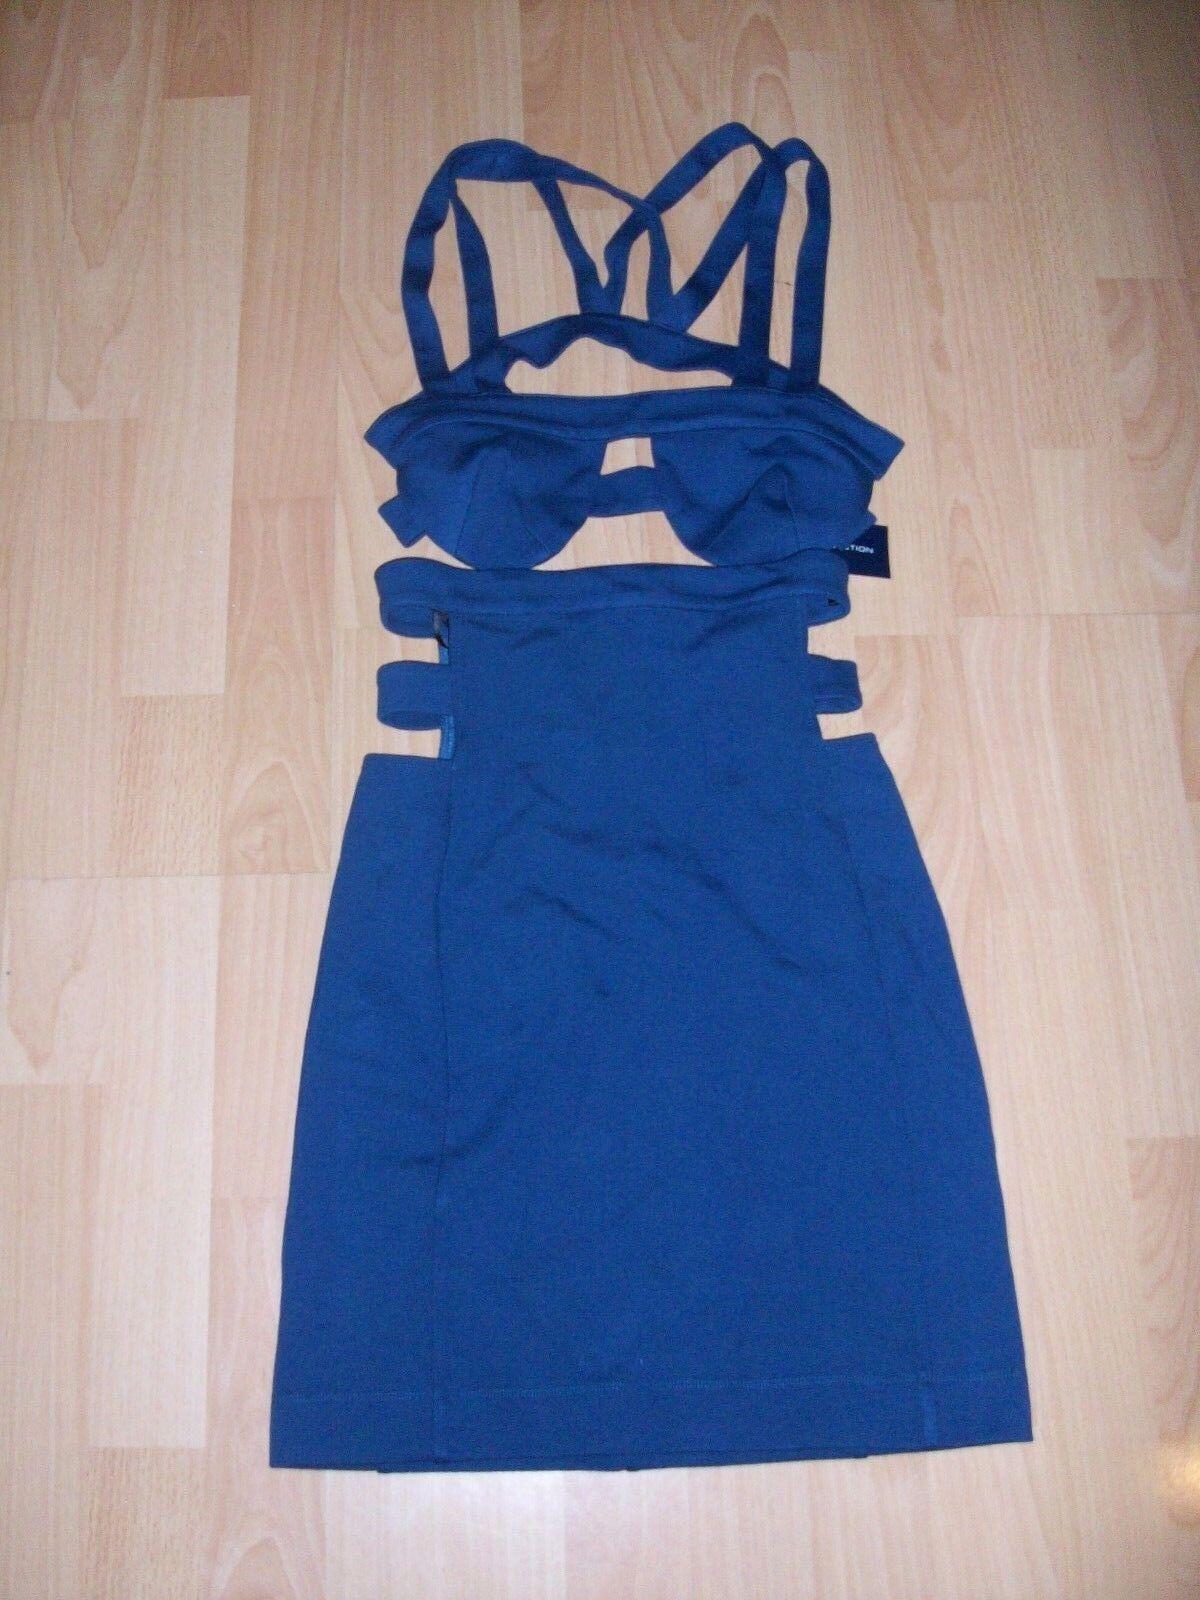 BNWT FCUK French Connection @ ASOS bluee Lula Bodycon Cutout Sexy Party Dress